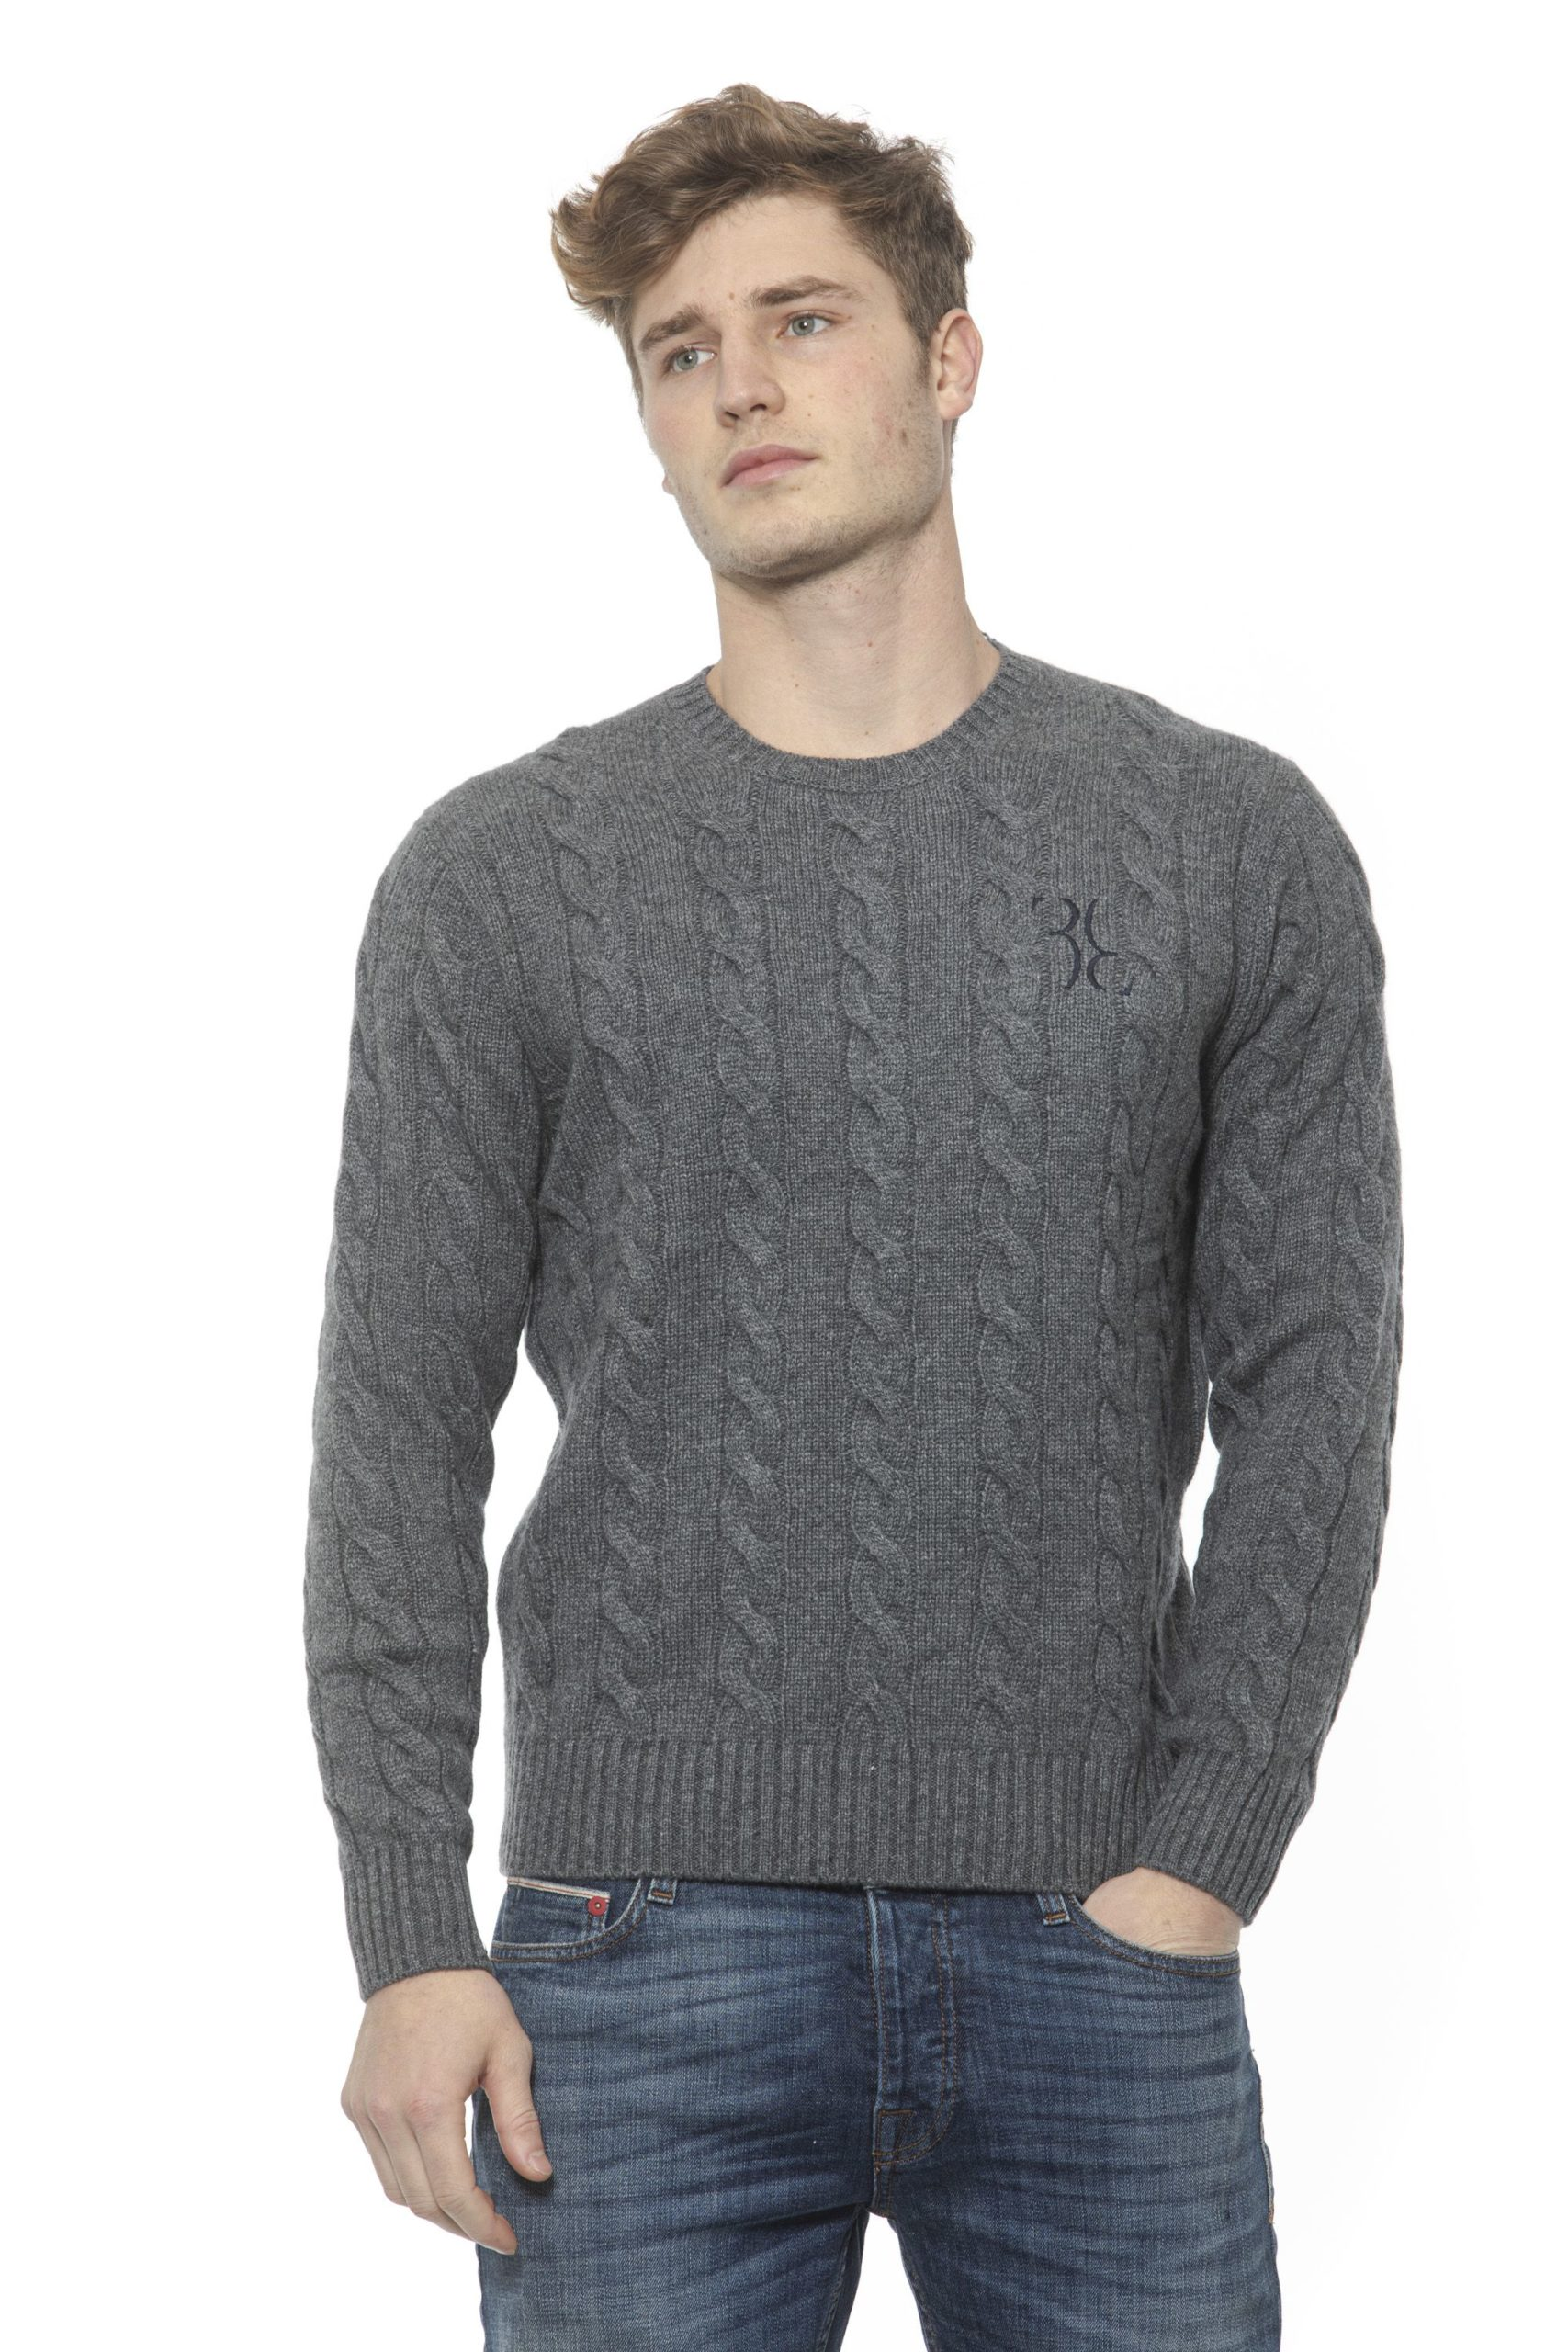 Billionaire Italian Couture Men's Grigio Sweater Grey BI1313440 - S